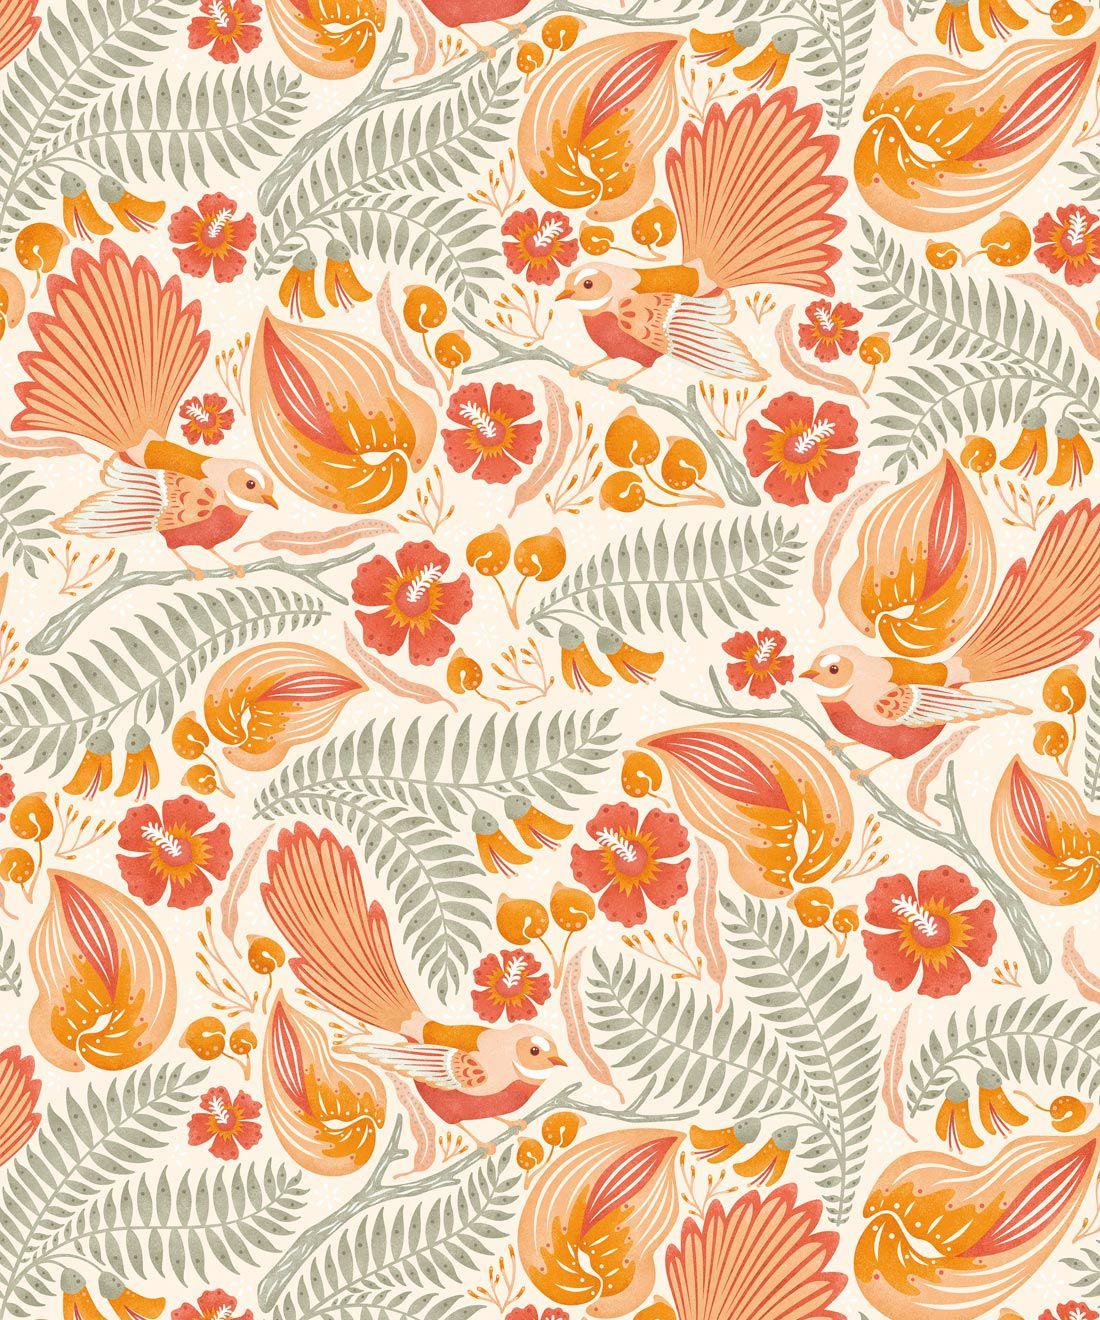 Faintails Wallpaper • New Zealand • Bird Wallpaper • Kowhai Tree • Kowhai Flowers • Orange Wallpaper • Light Colorway